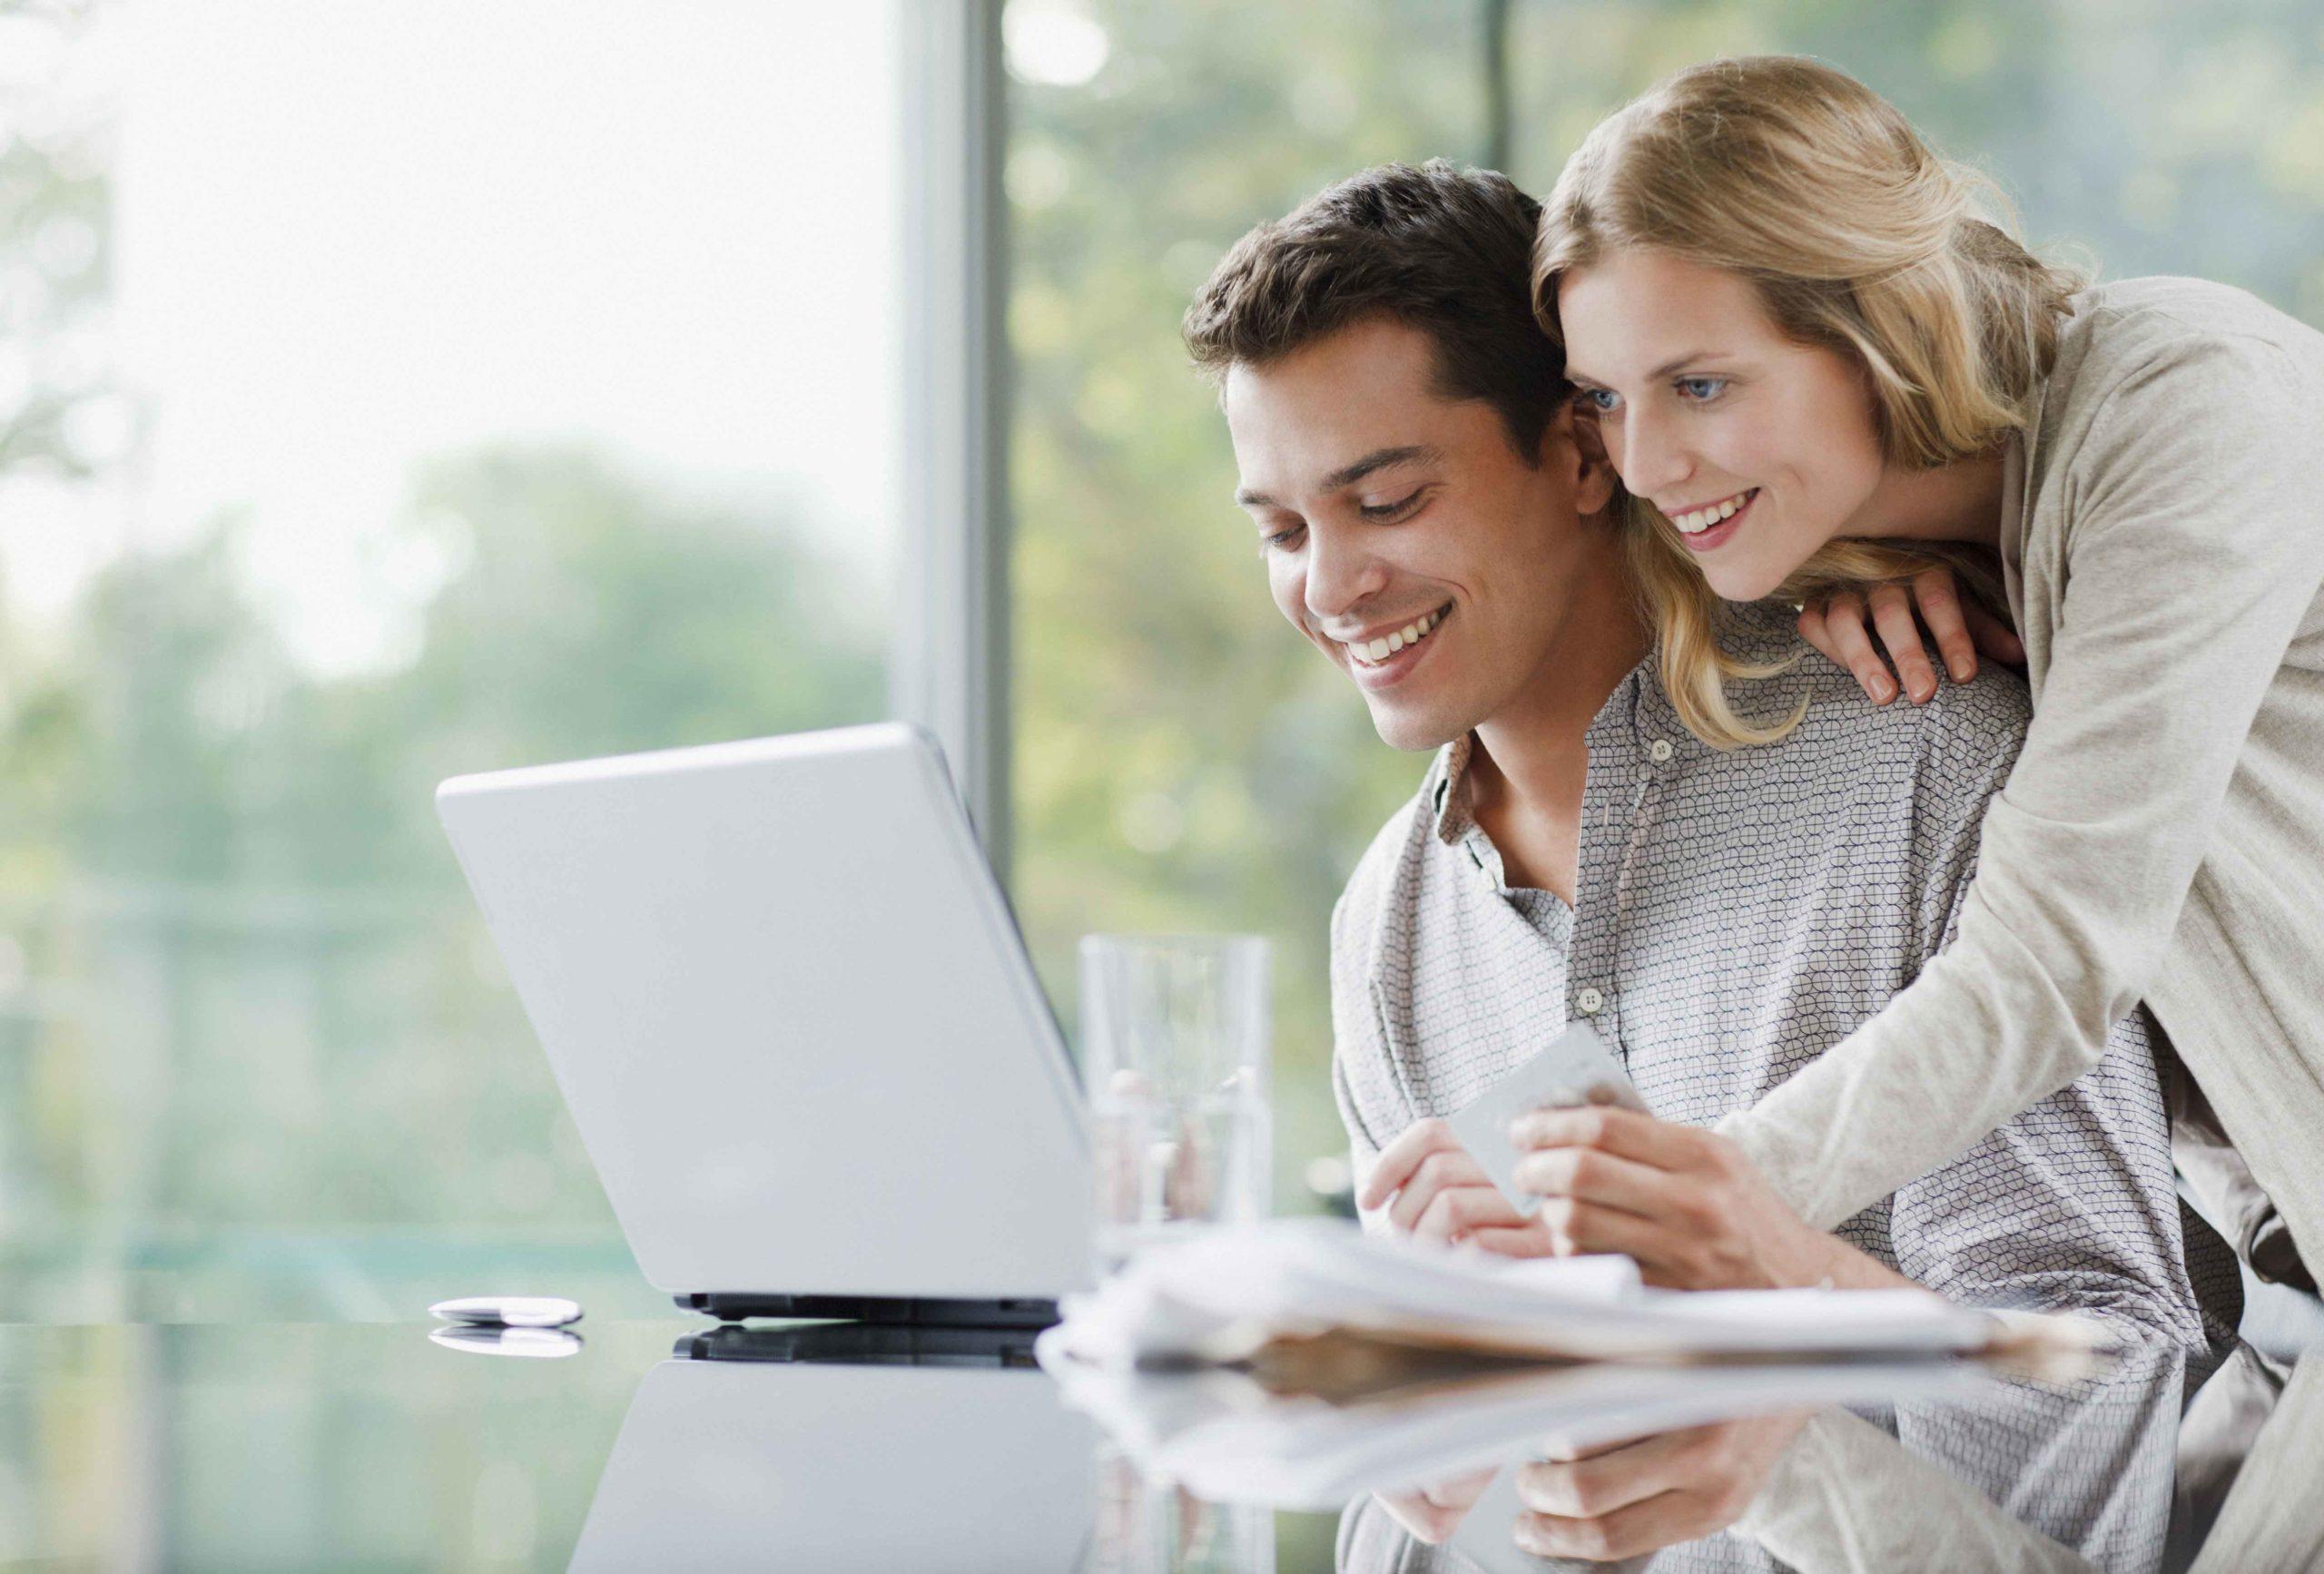 aar online-shopping mit Kreditkarte